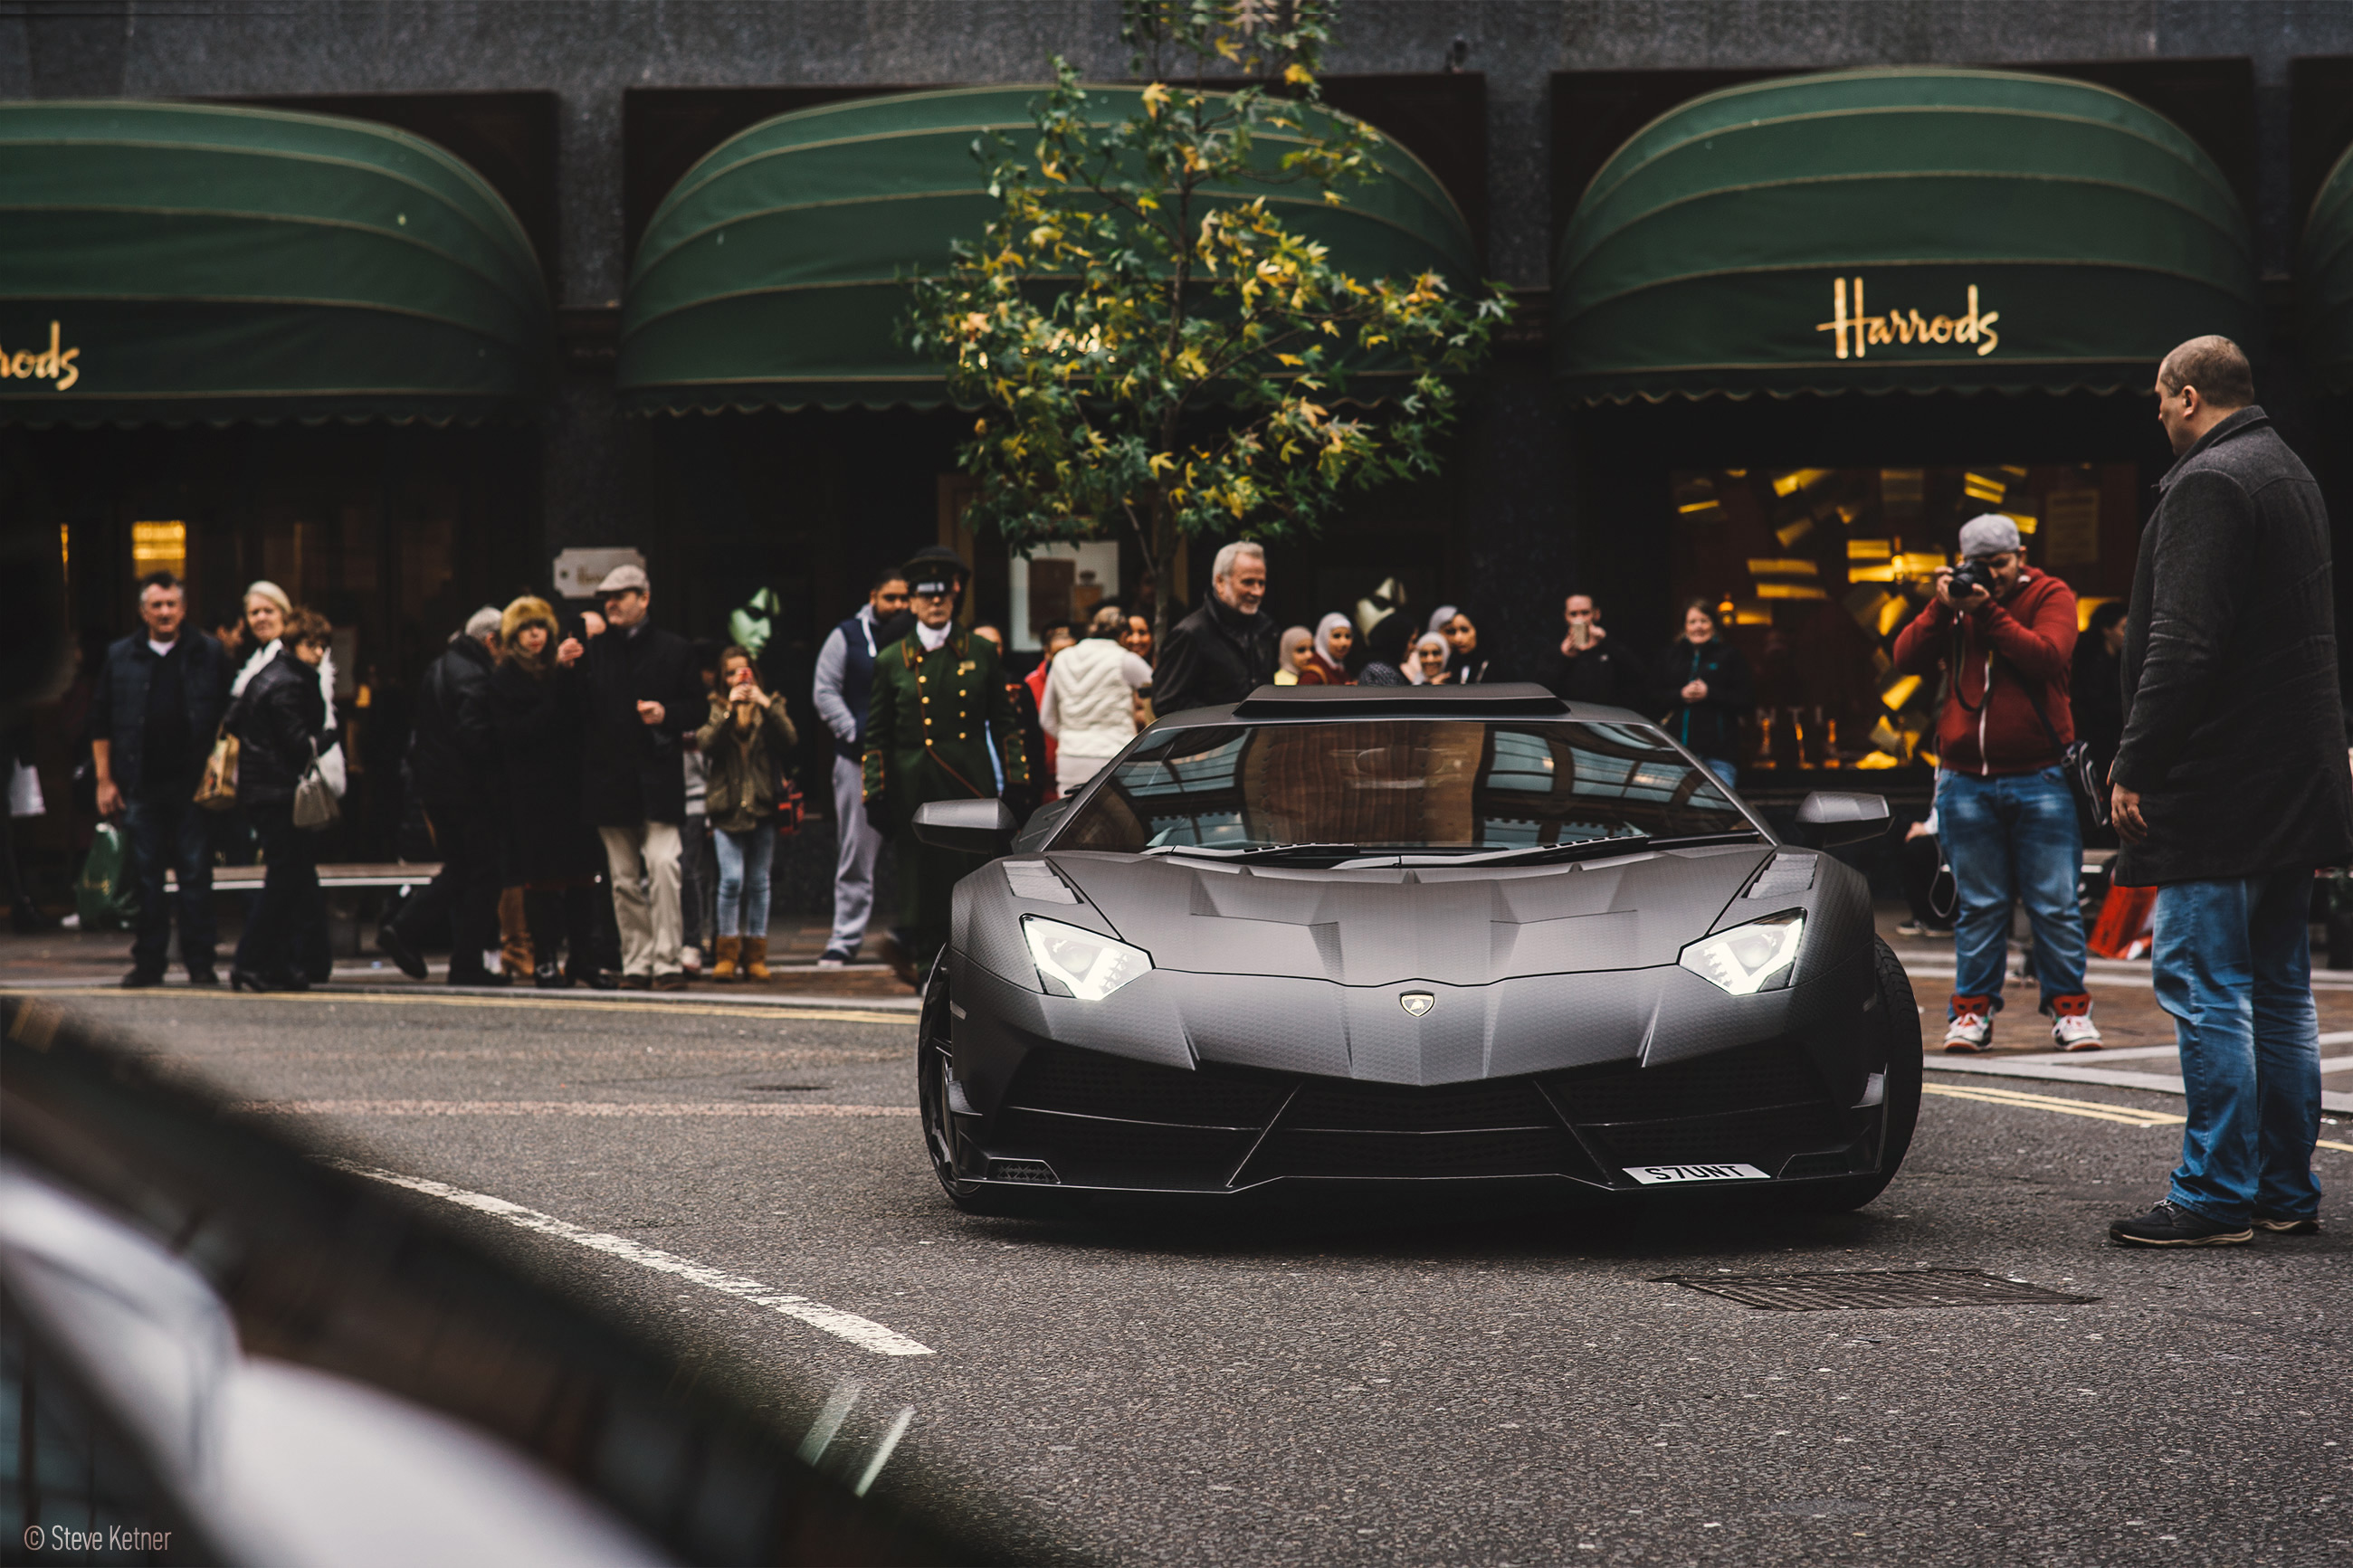 Steve Ketner - James Stunt £3.1 million Lamborghini